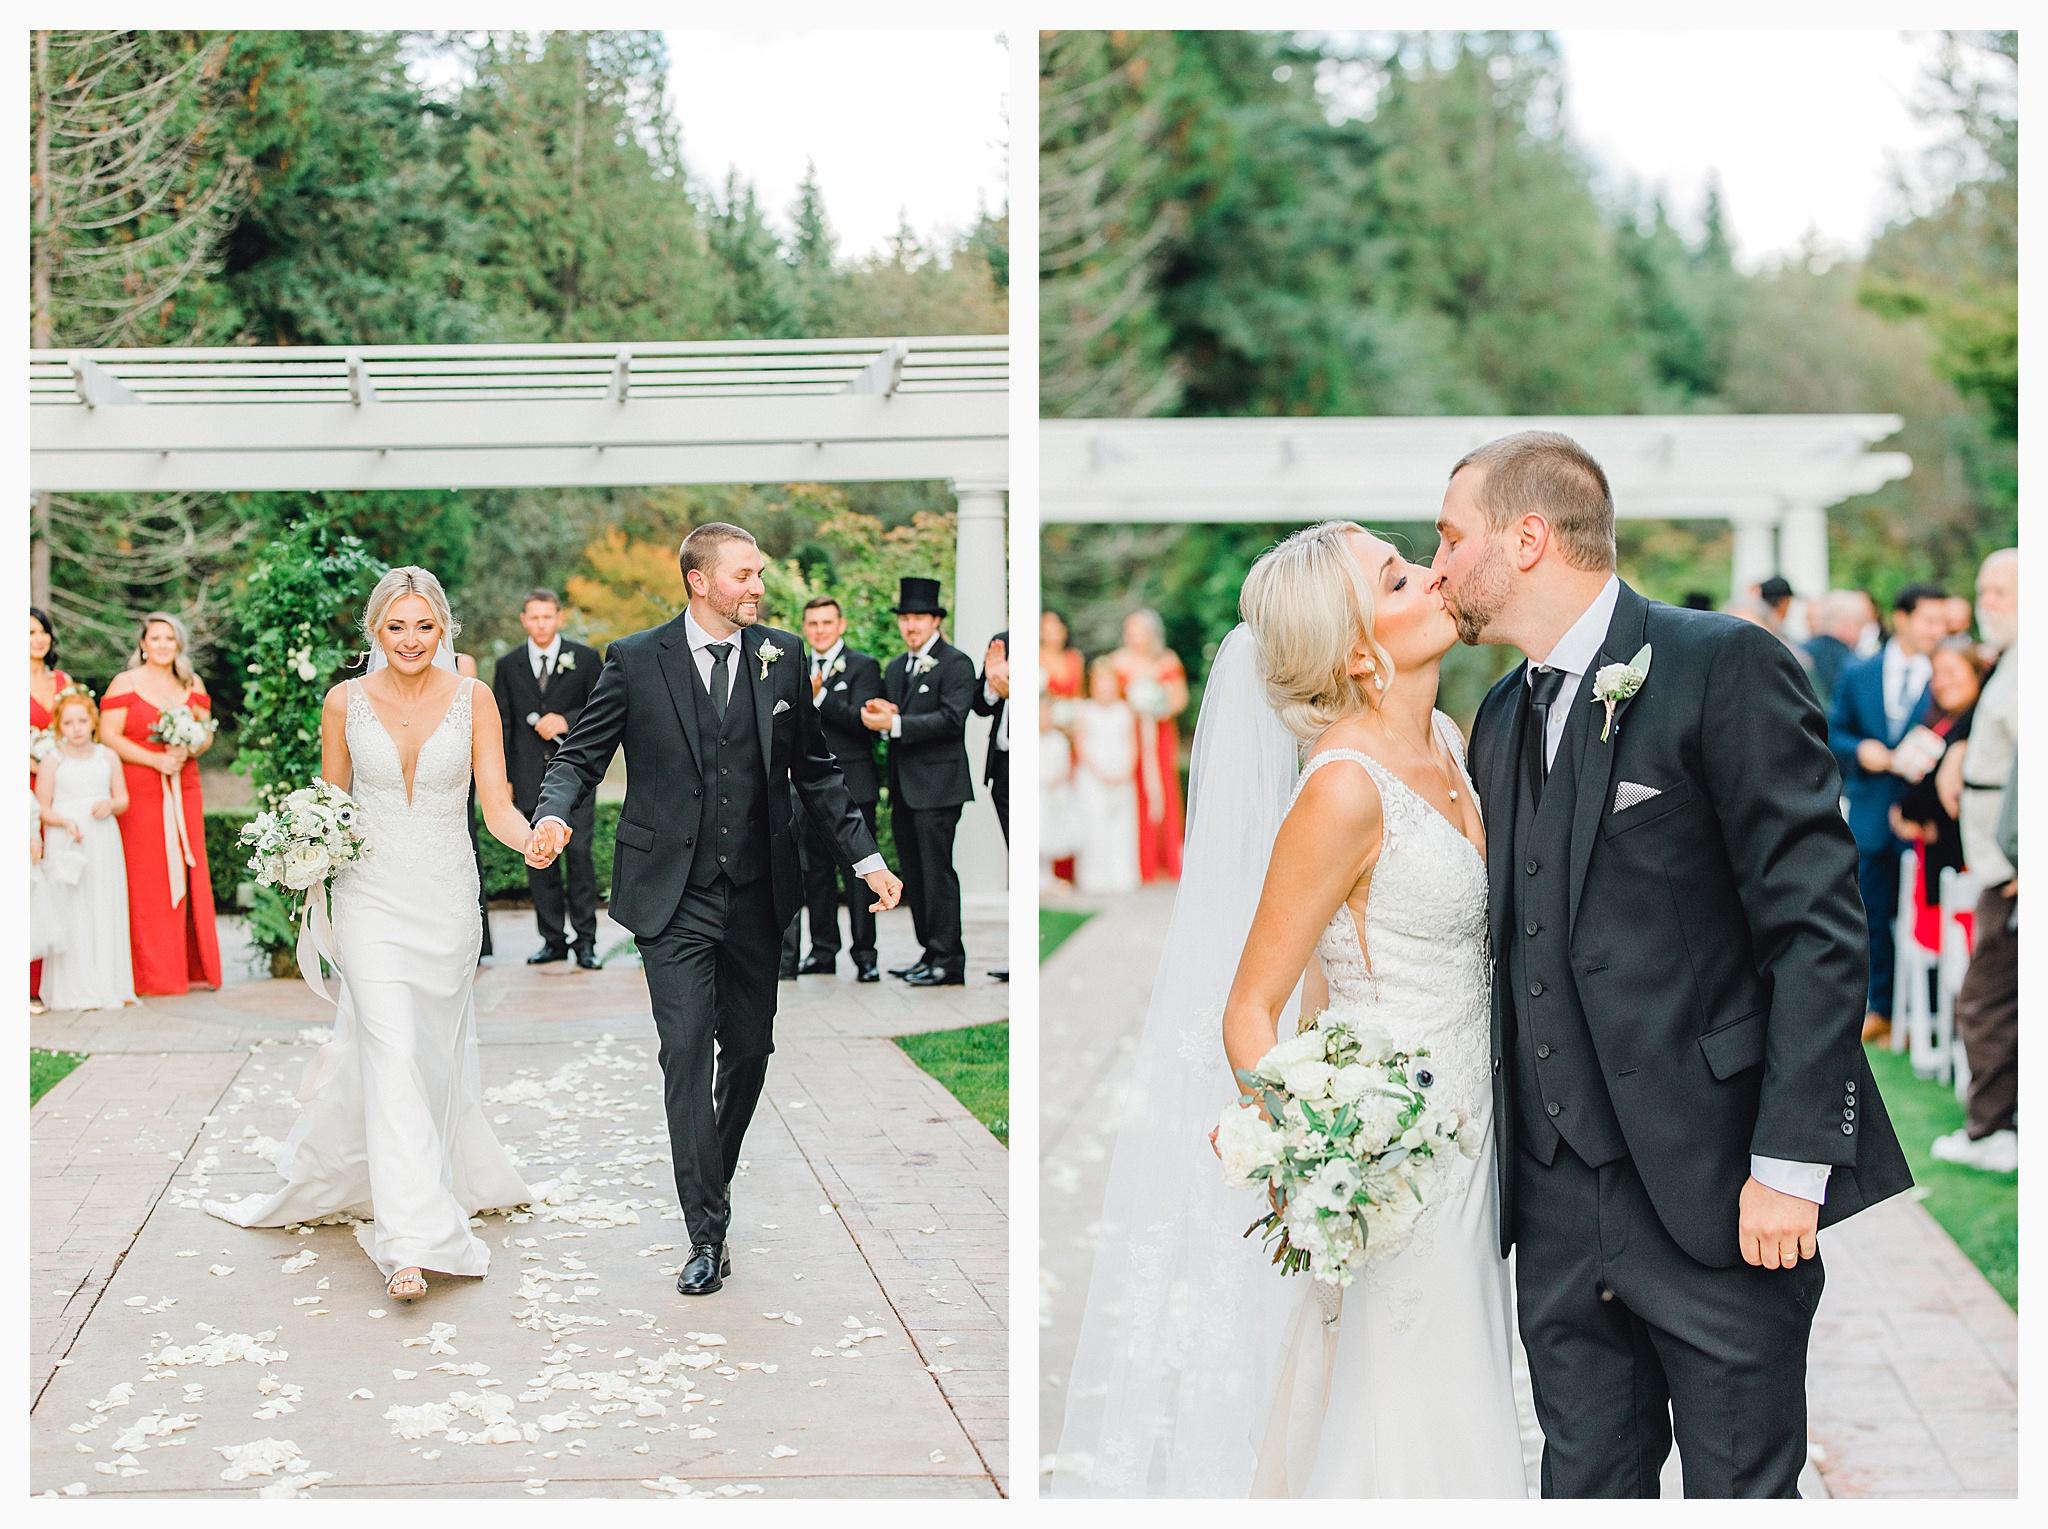 Emma Rose Company Light and Airy Wedding Photographer, Beautiful fall wedding at Rock Creek Gardens Venue in Puyallup, Washington._0080.jpg